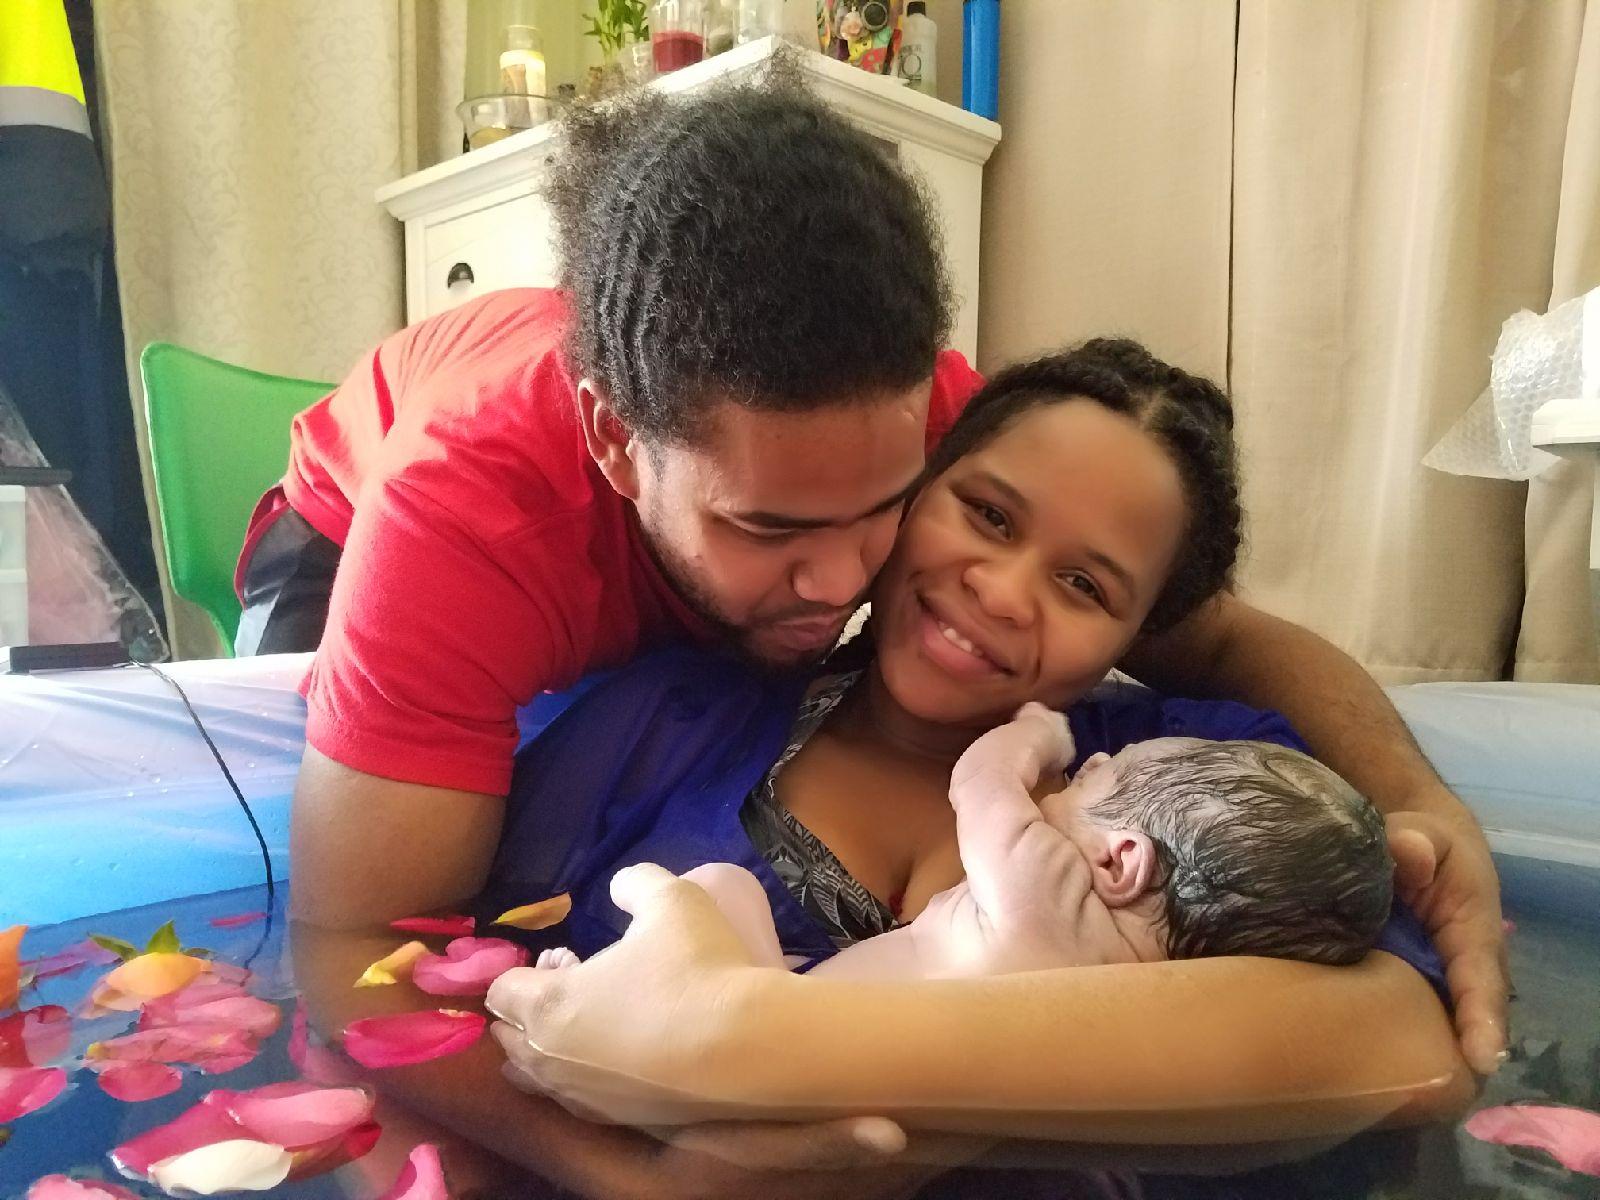 Homebirth Midwifery in Massachusetts - Alternative Birth Care